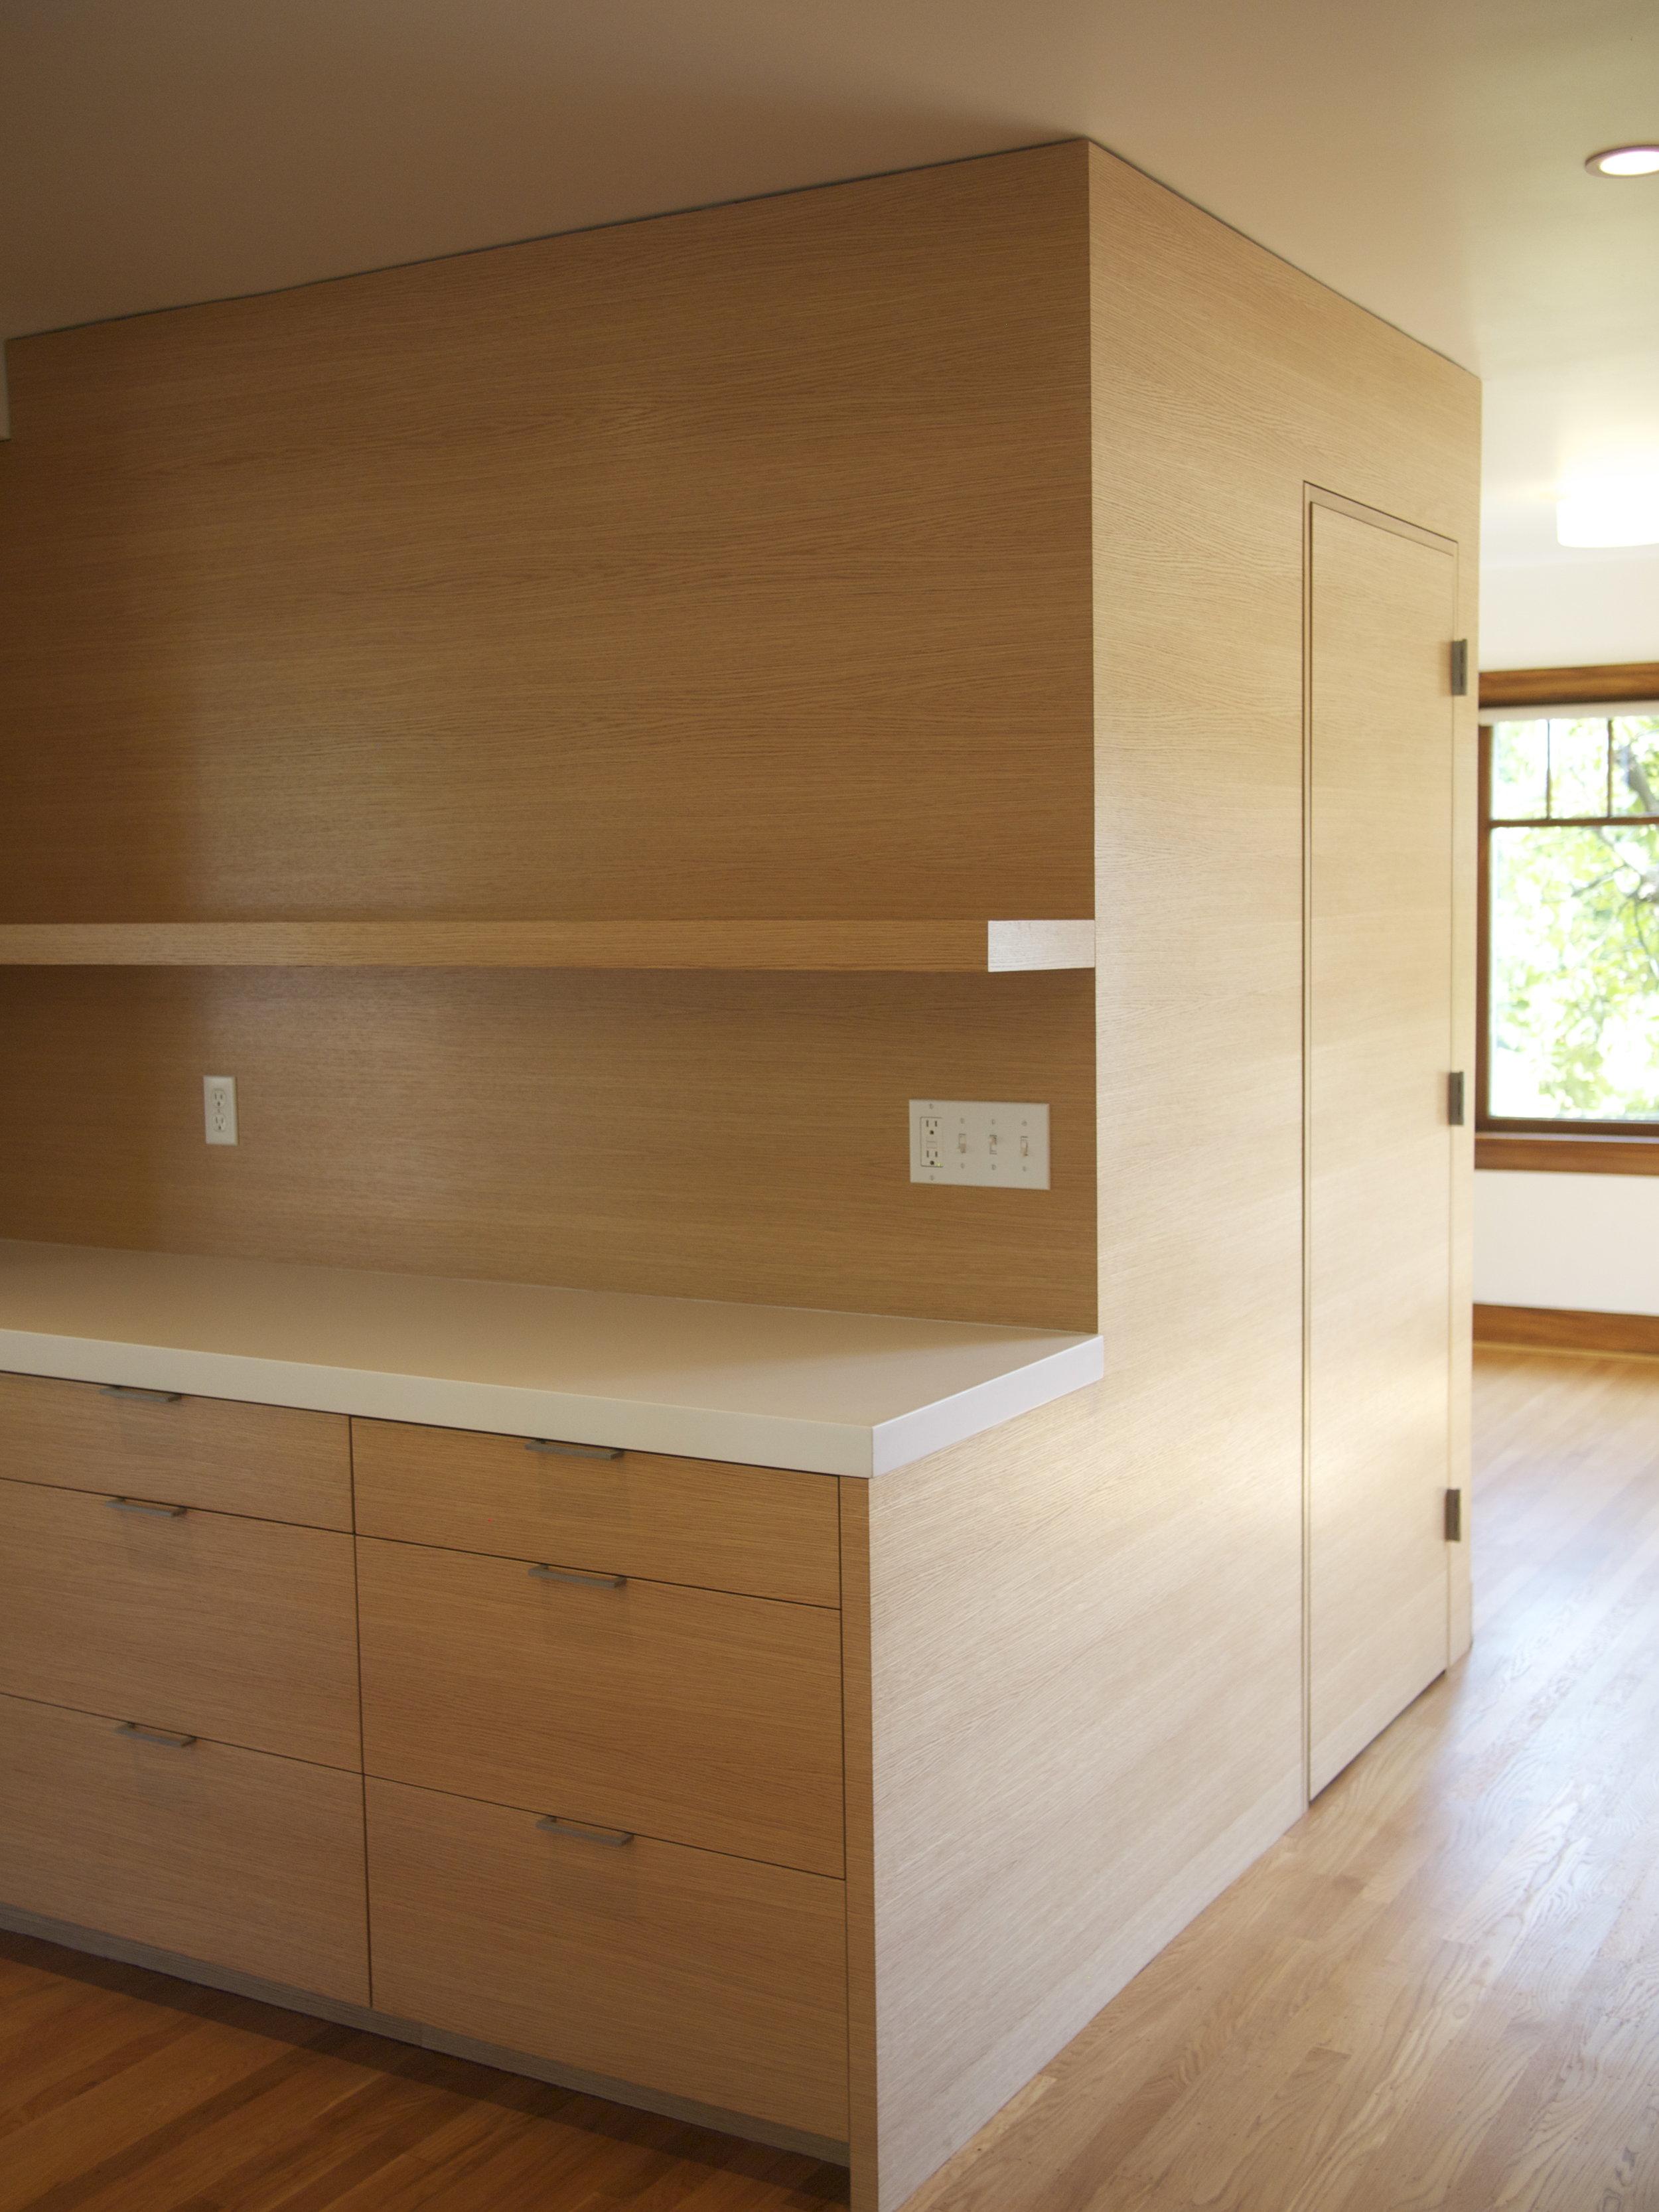 cabinets 3.jpg